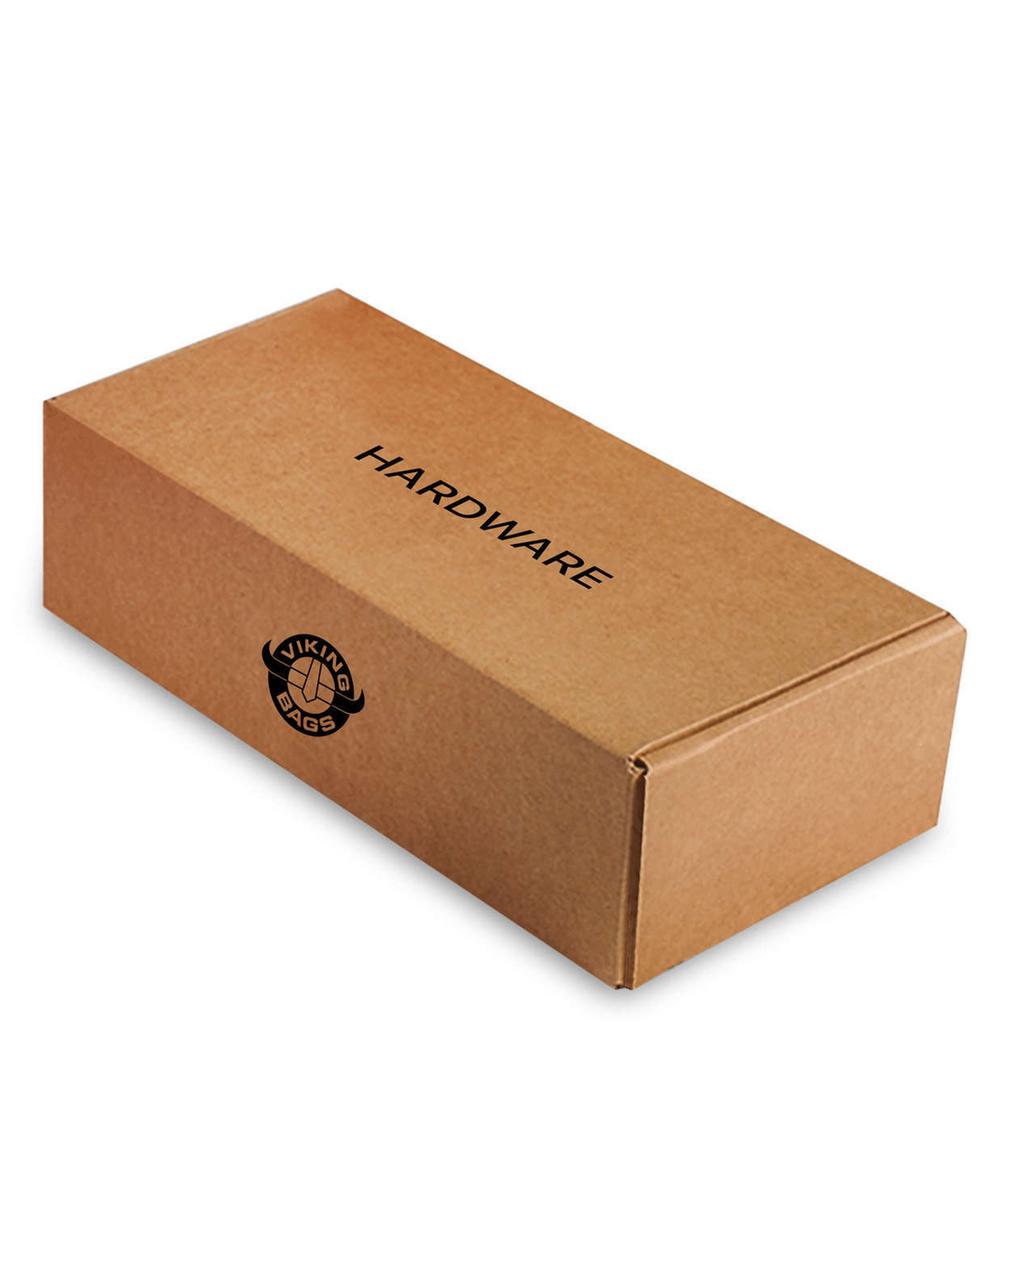 Triumph Rocket III Range Charger Single Strap Studded Large Motorcycle Saddlebags Box